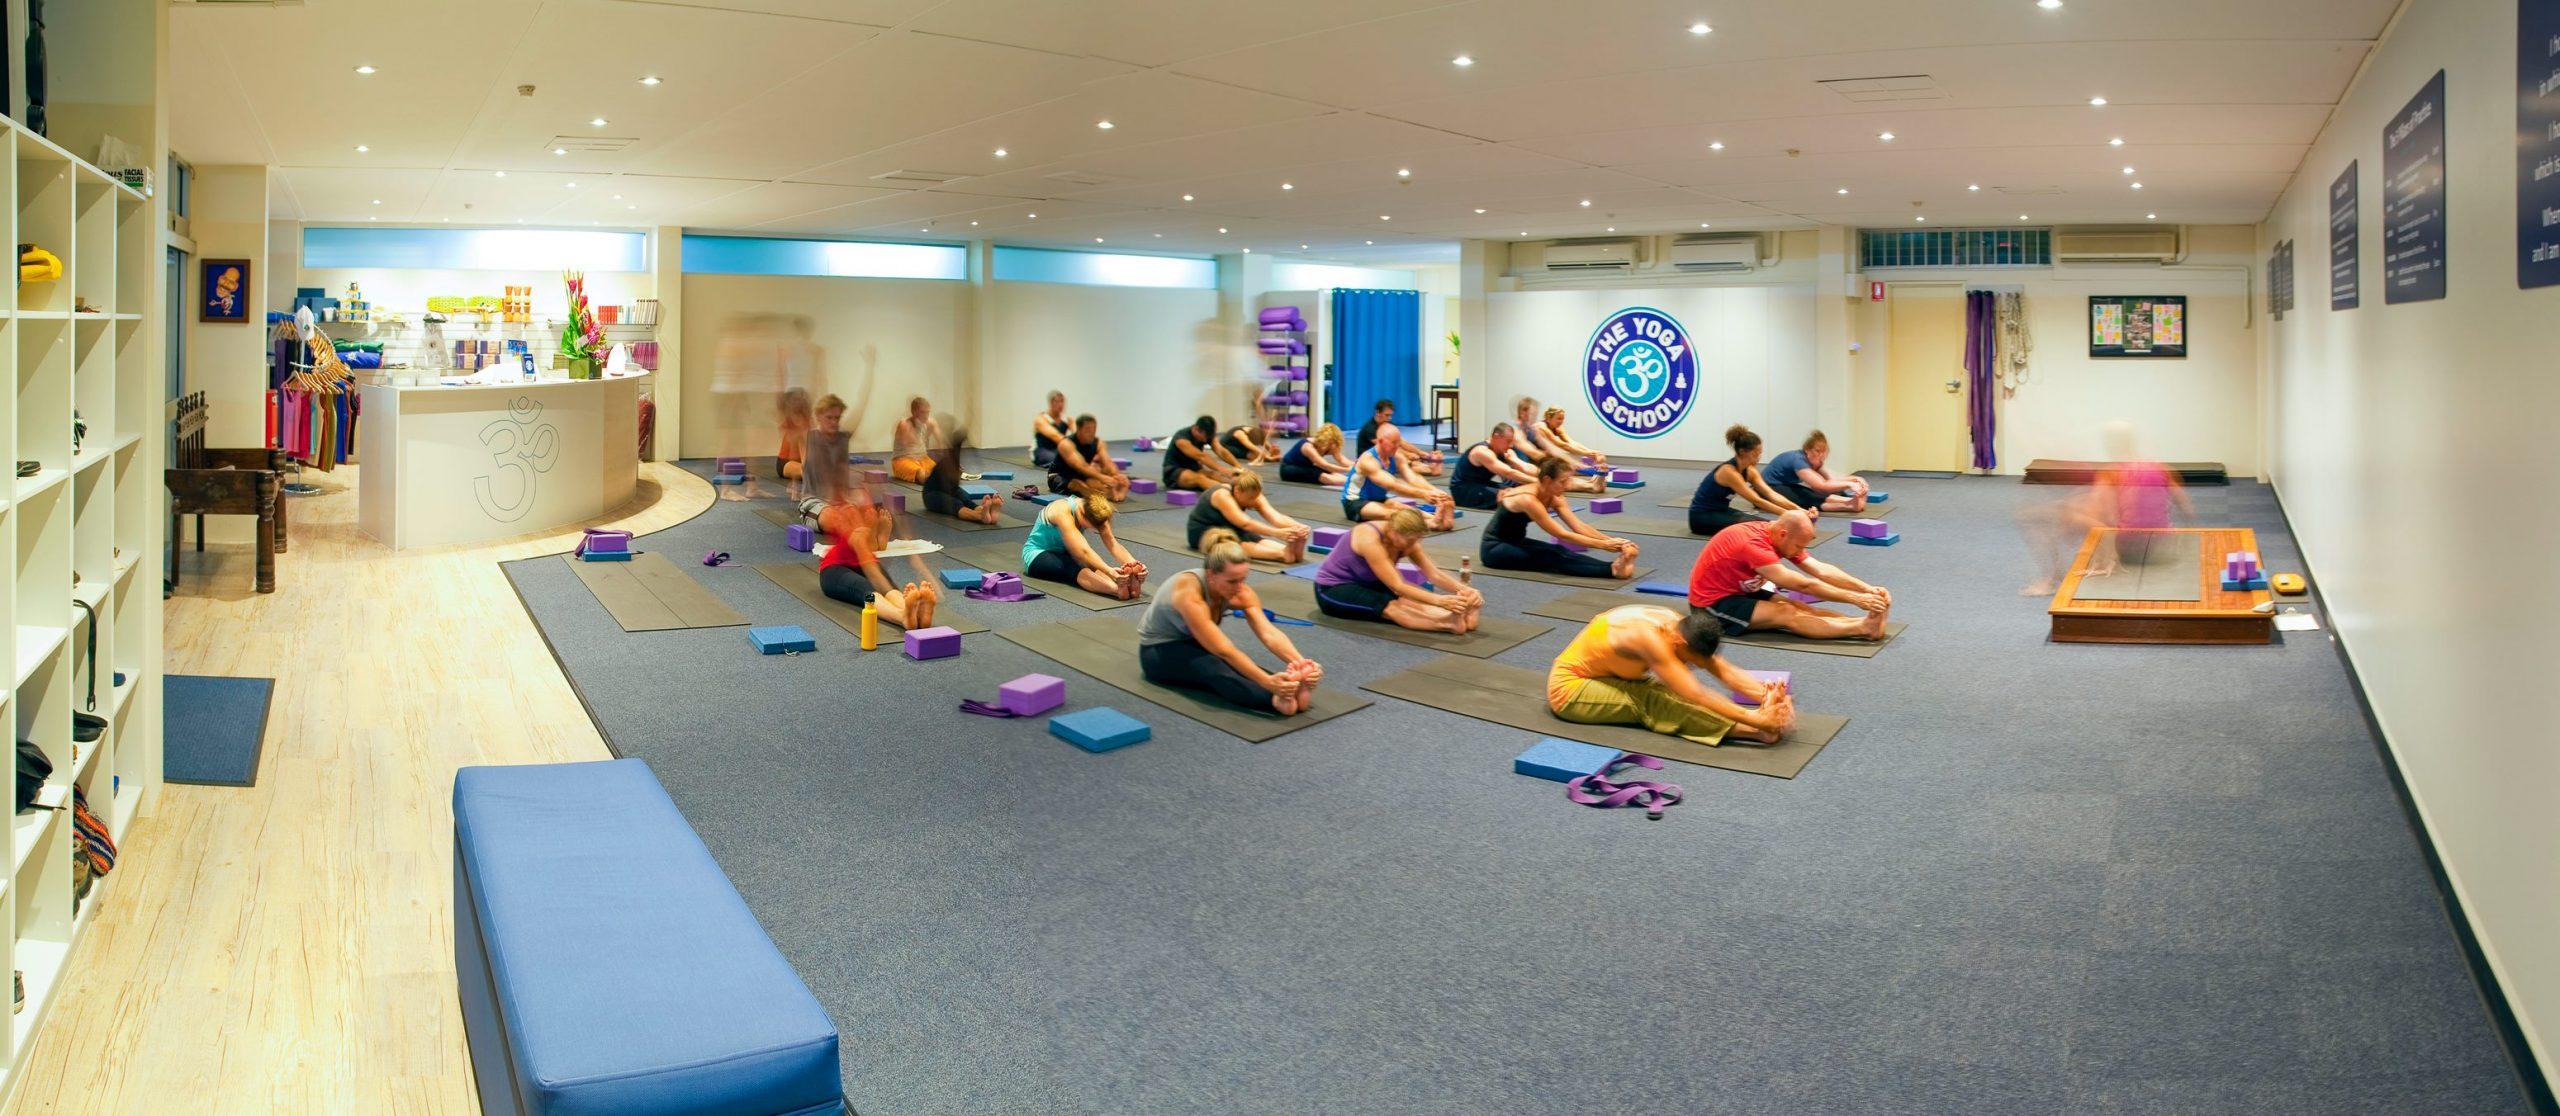 The Yoga School